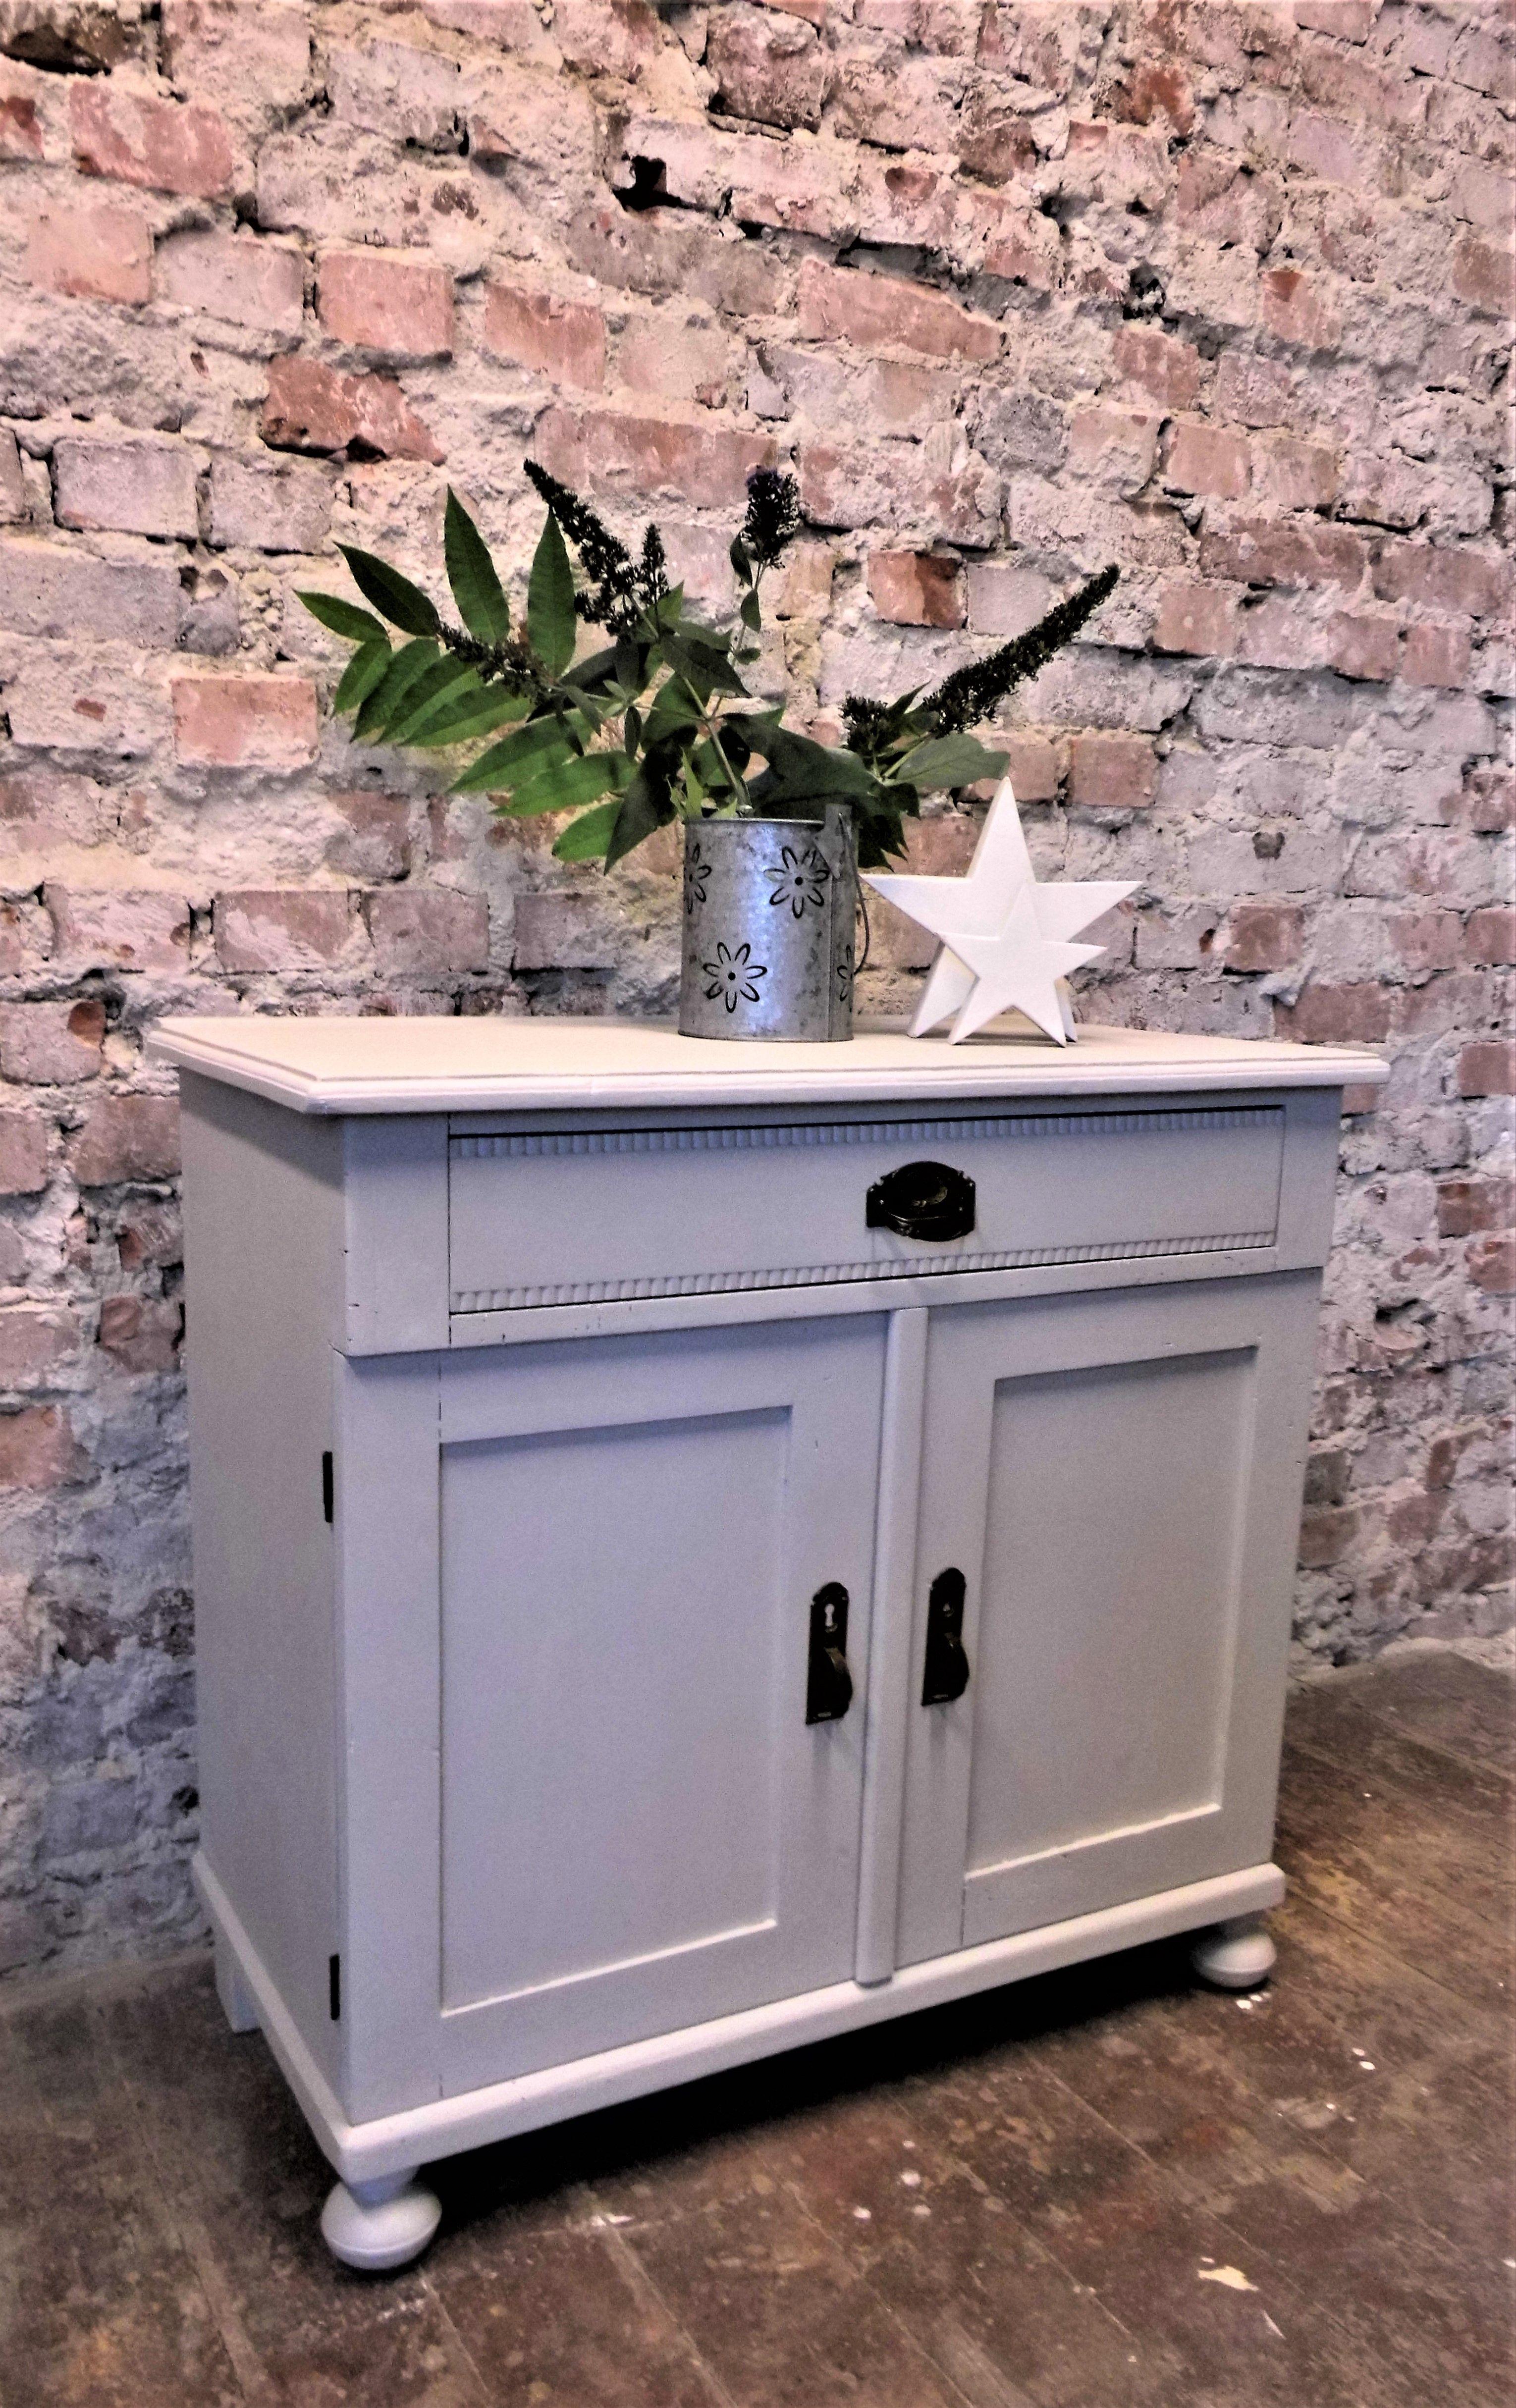 Cabinet Cupboard Cupboard Vintage Antique Chalk Color Maritim Vintage Scandinavian Design Light Grey Grey And White Dressing Scandinavian Design Cabinet Cupboard Cabinet